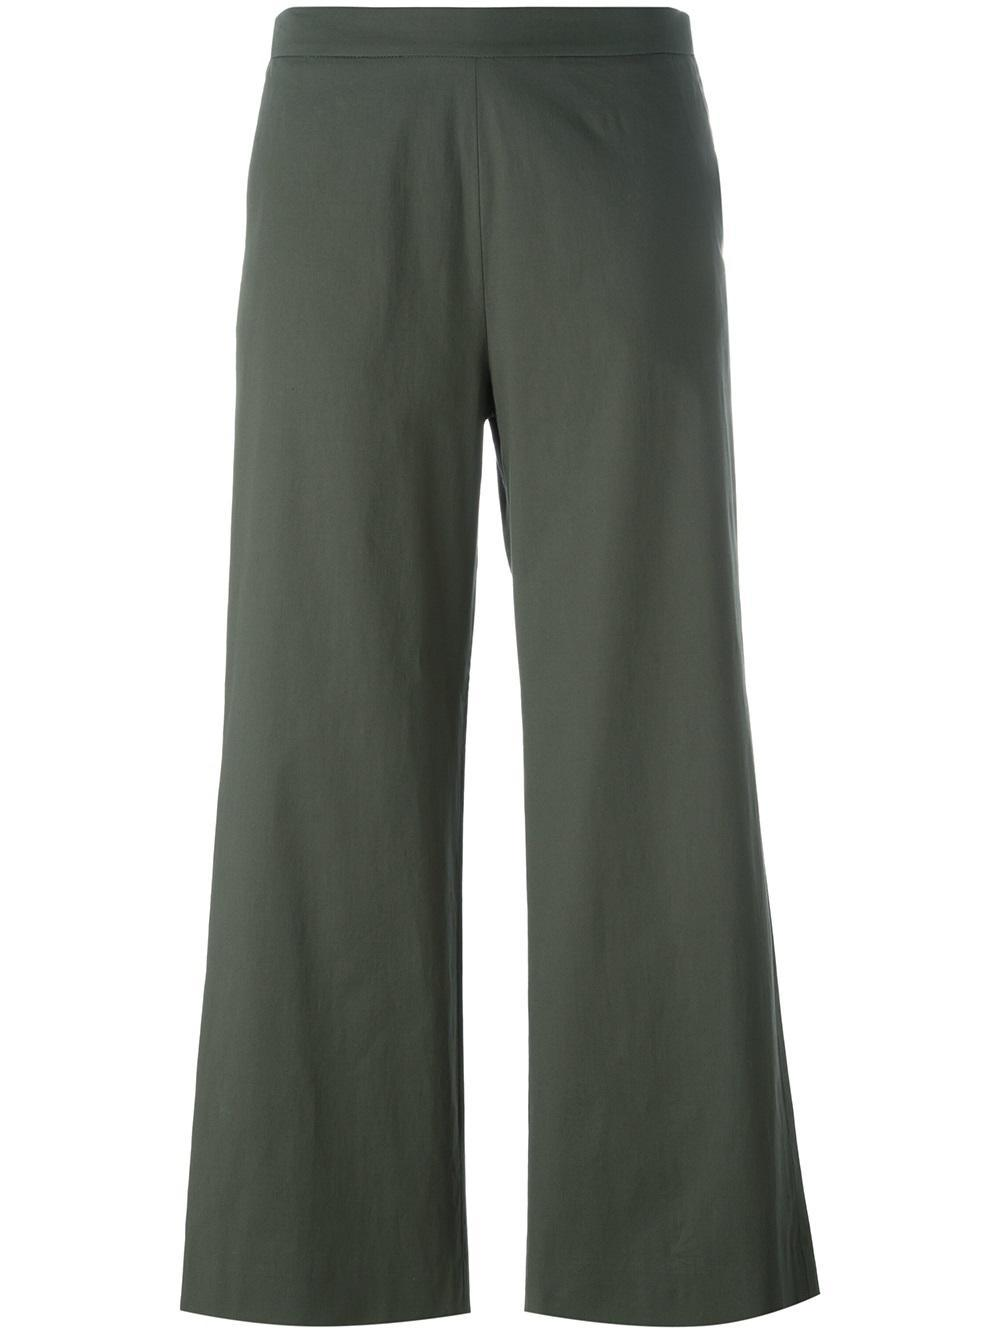 Fabiana filippi - Cropped Trousers - Women